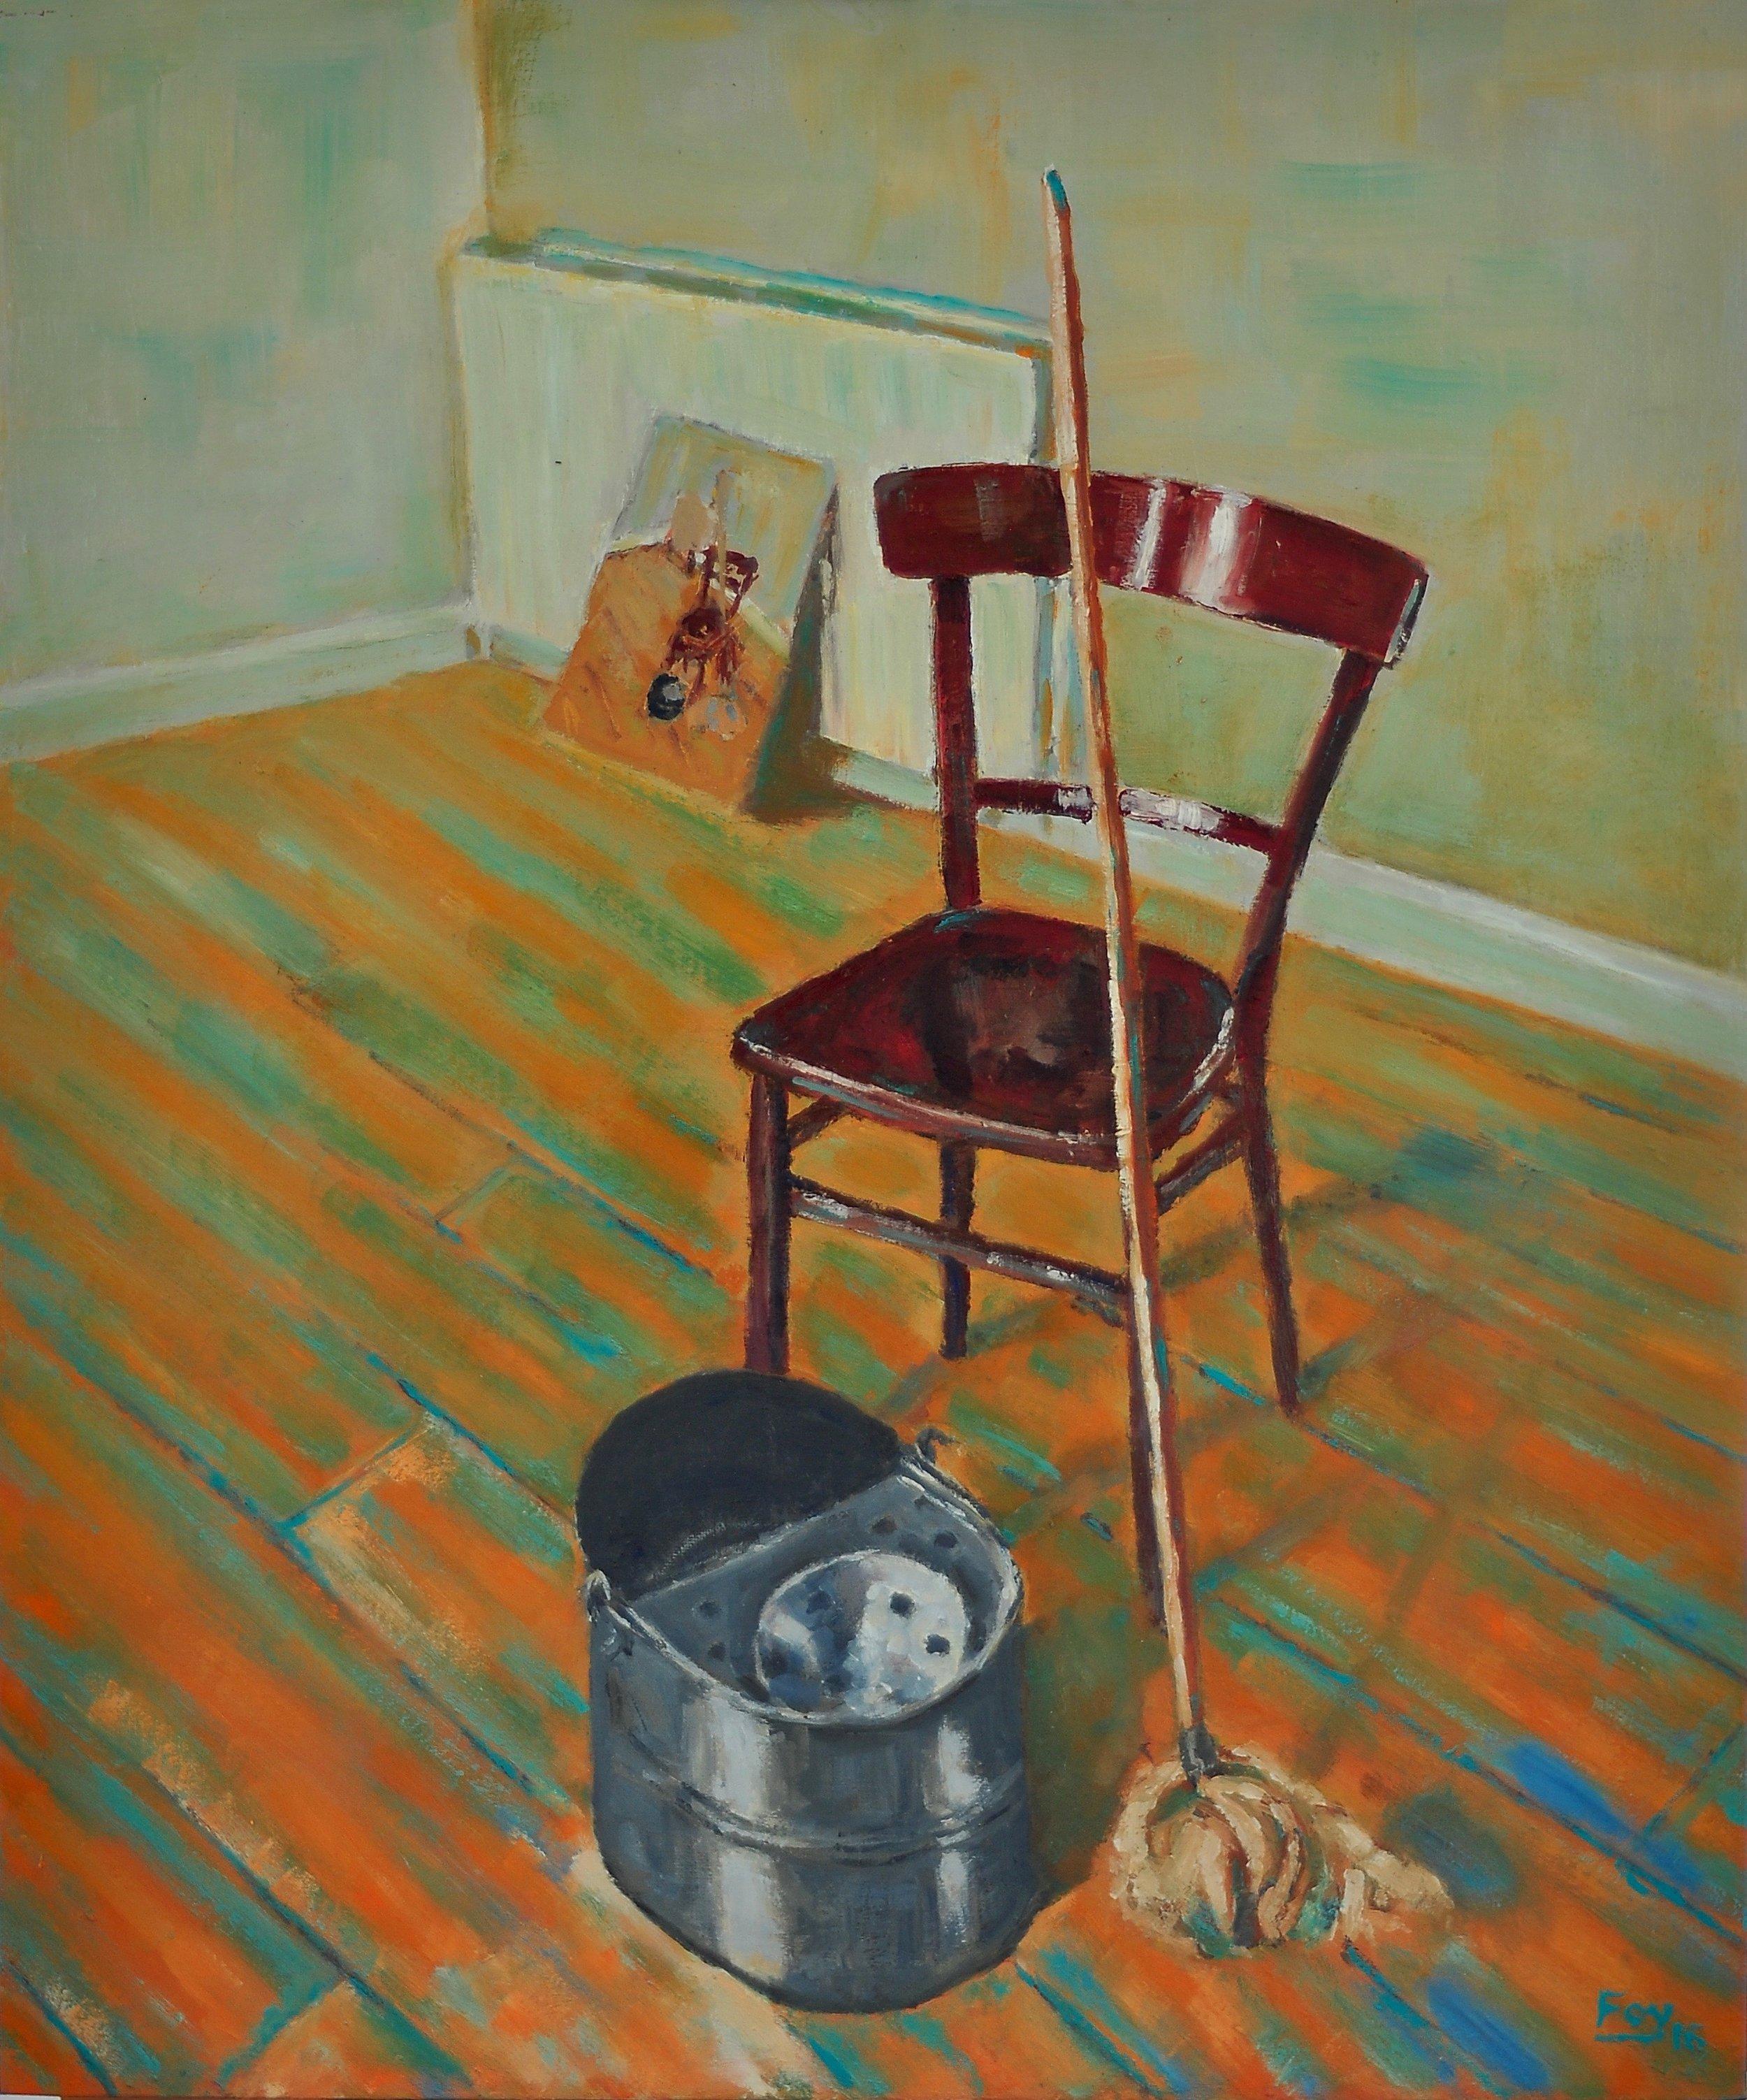 2016 mop and bucket.jpg